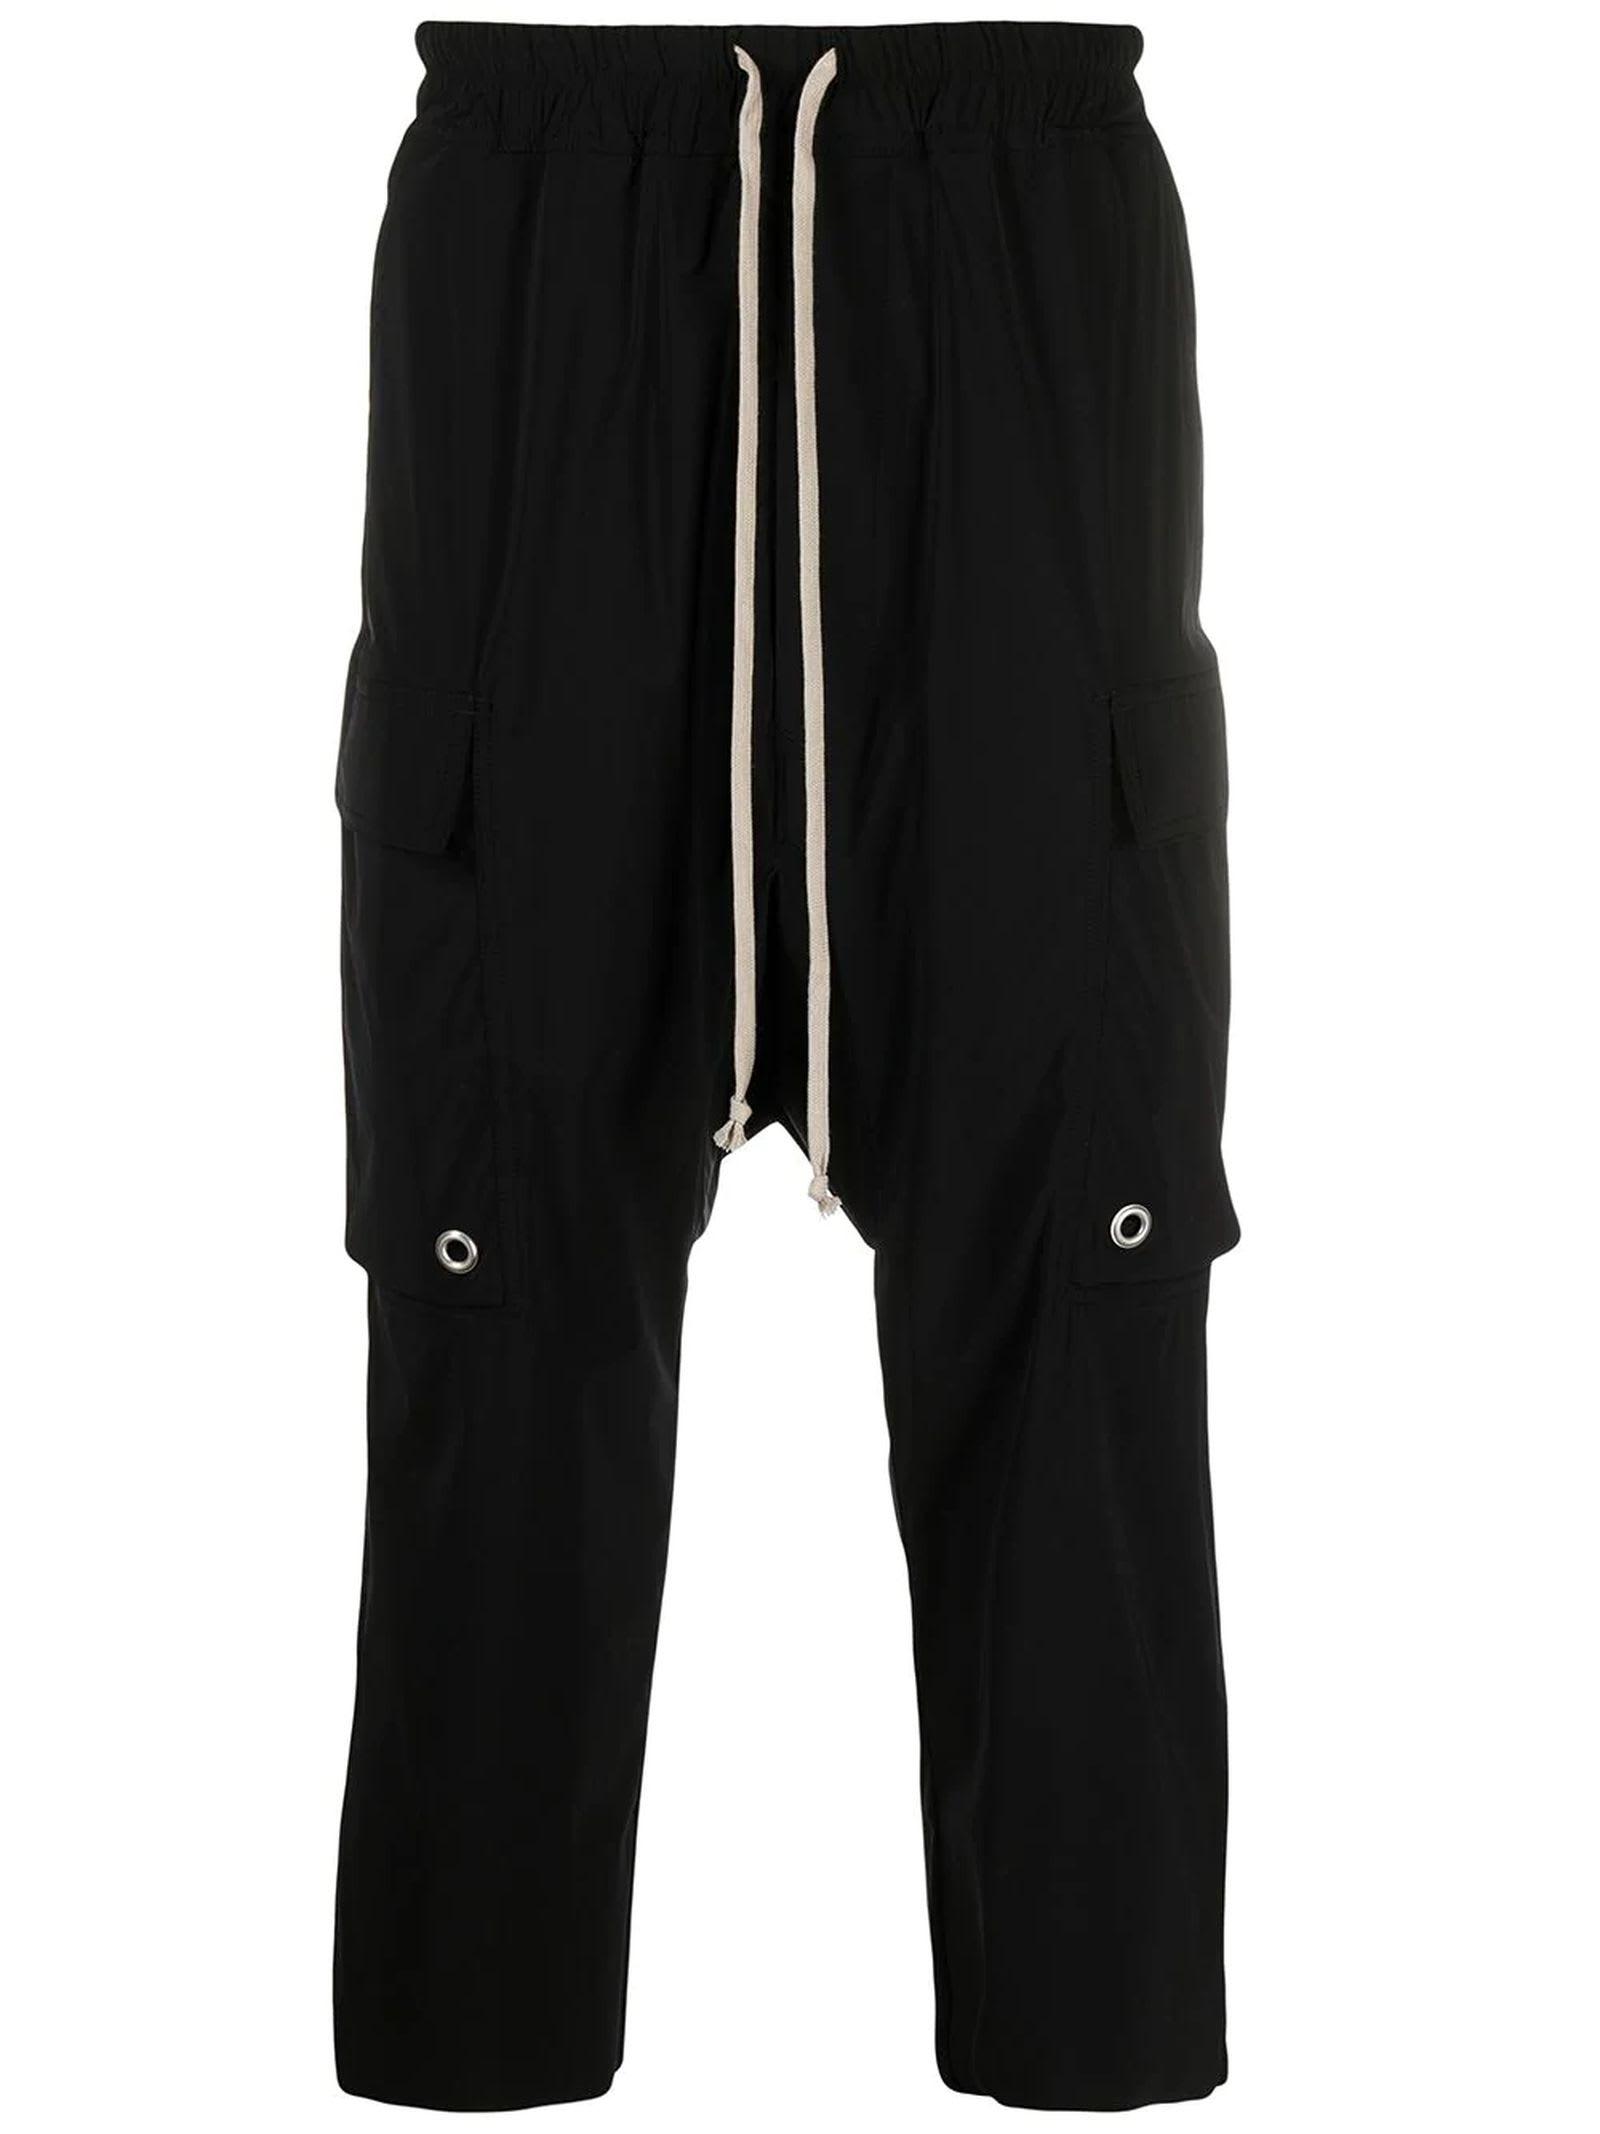 Rick Owens Black Drop-crotch Trousers